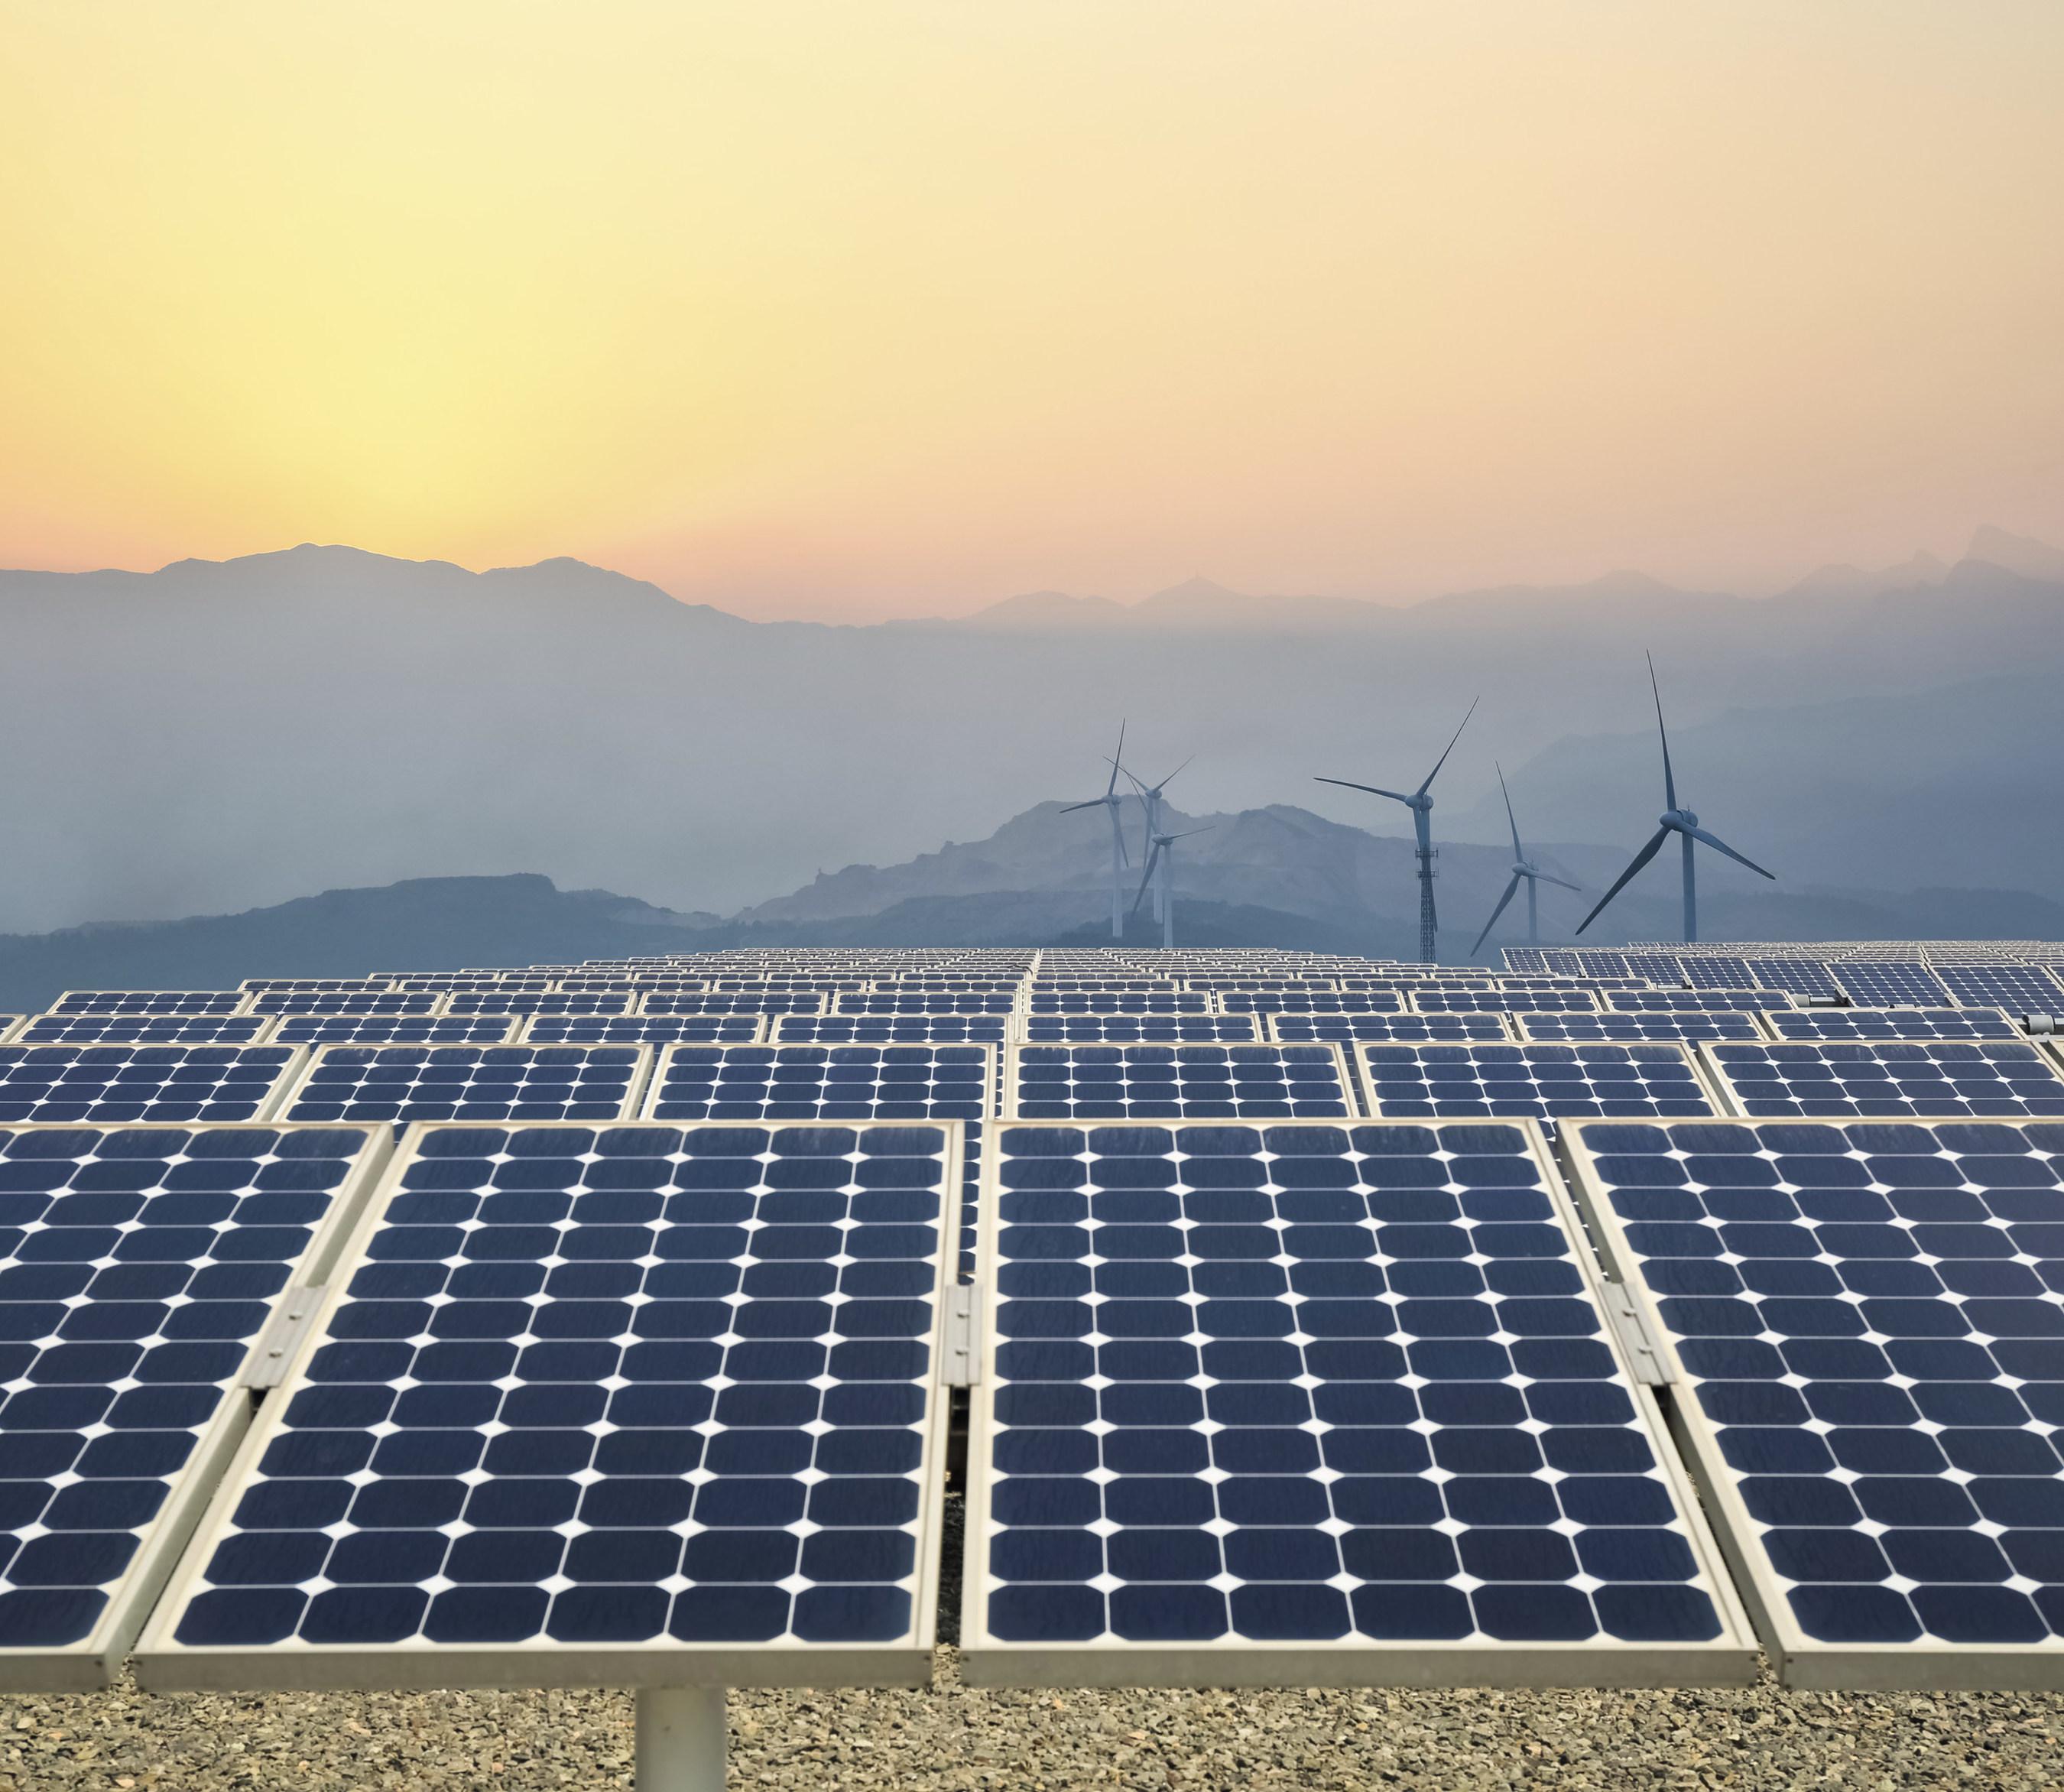 Solar Farm Developer Offers 5.5GW Pipeline of 20MW-80MW Size Solar Projects